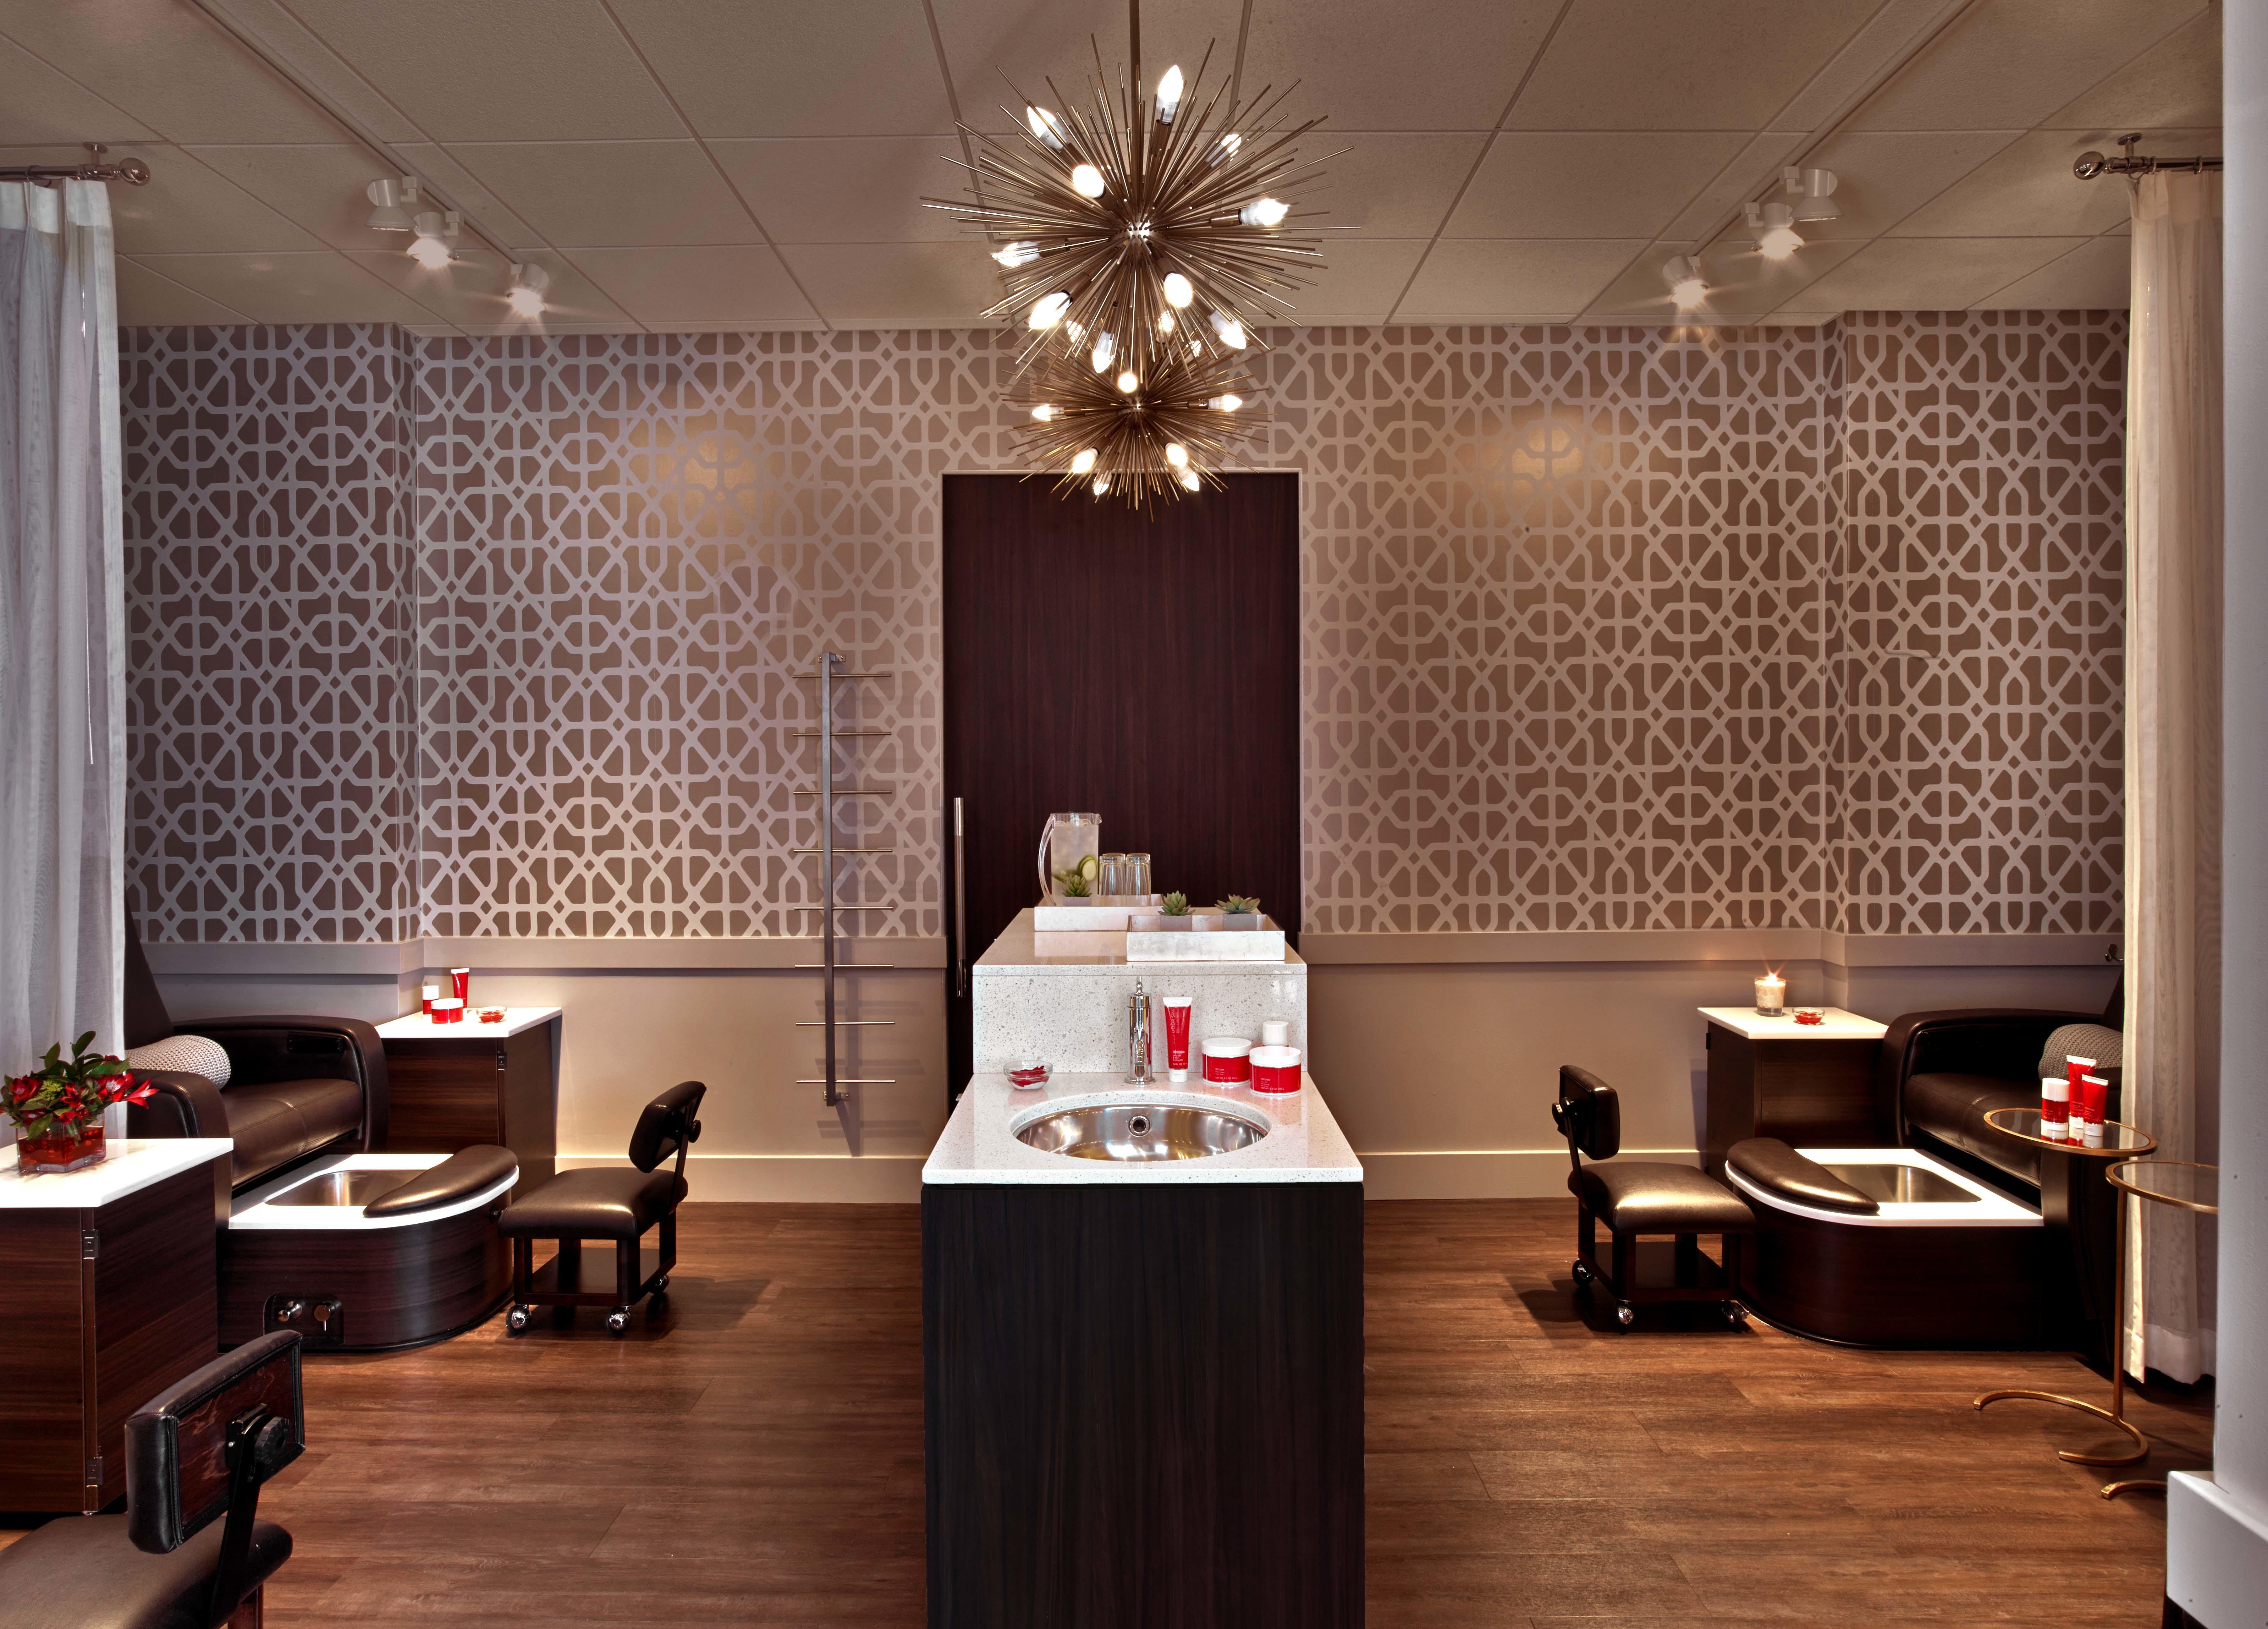 The Red Door Salon Spa In Deerfield Il